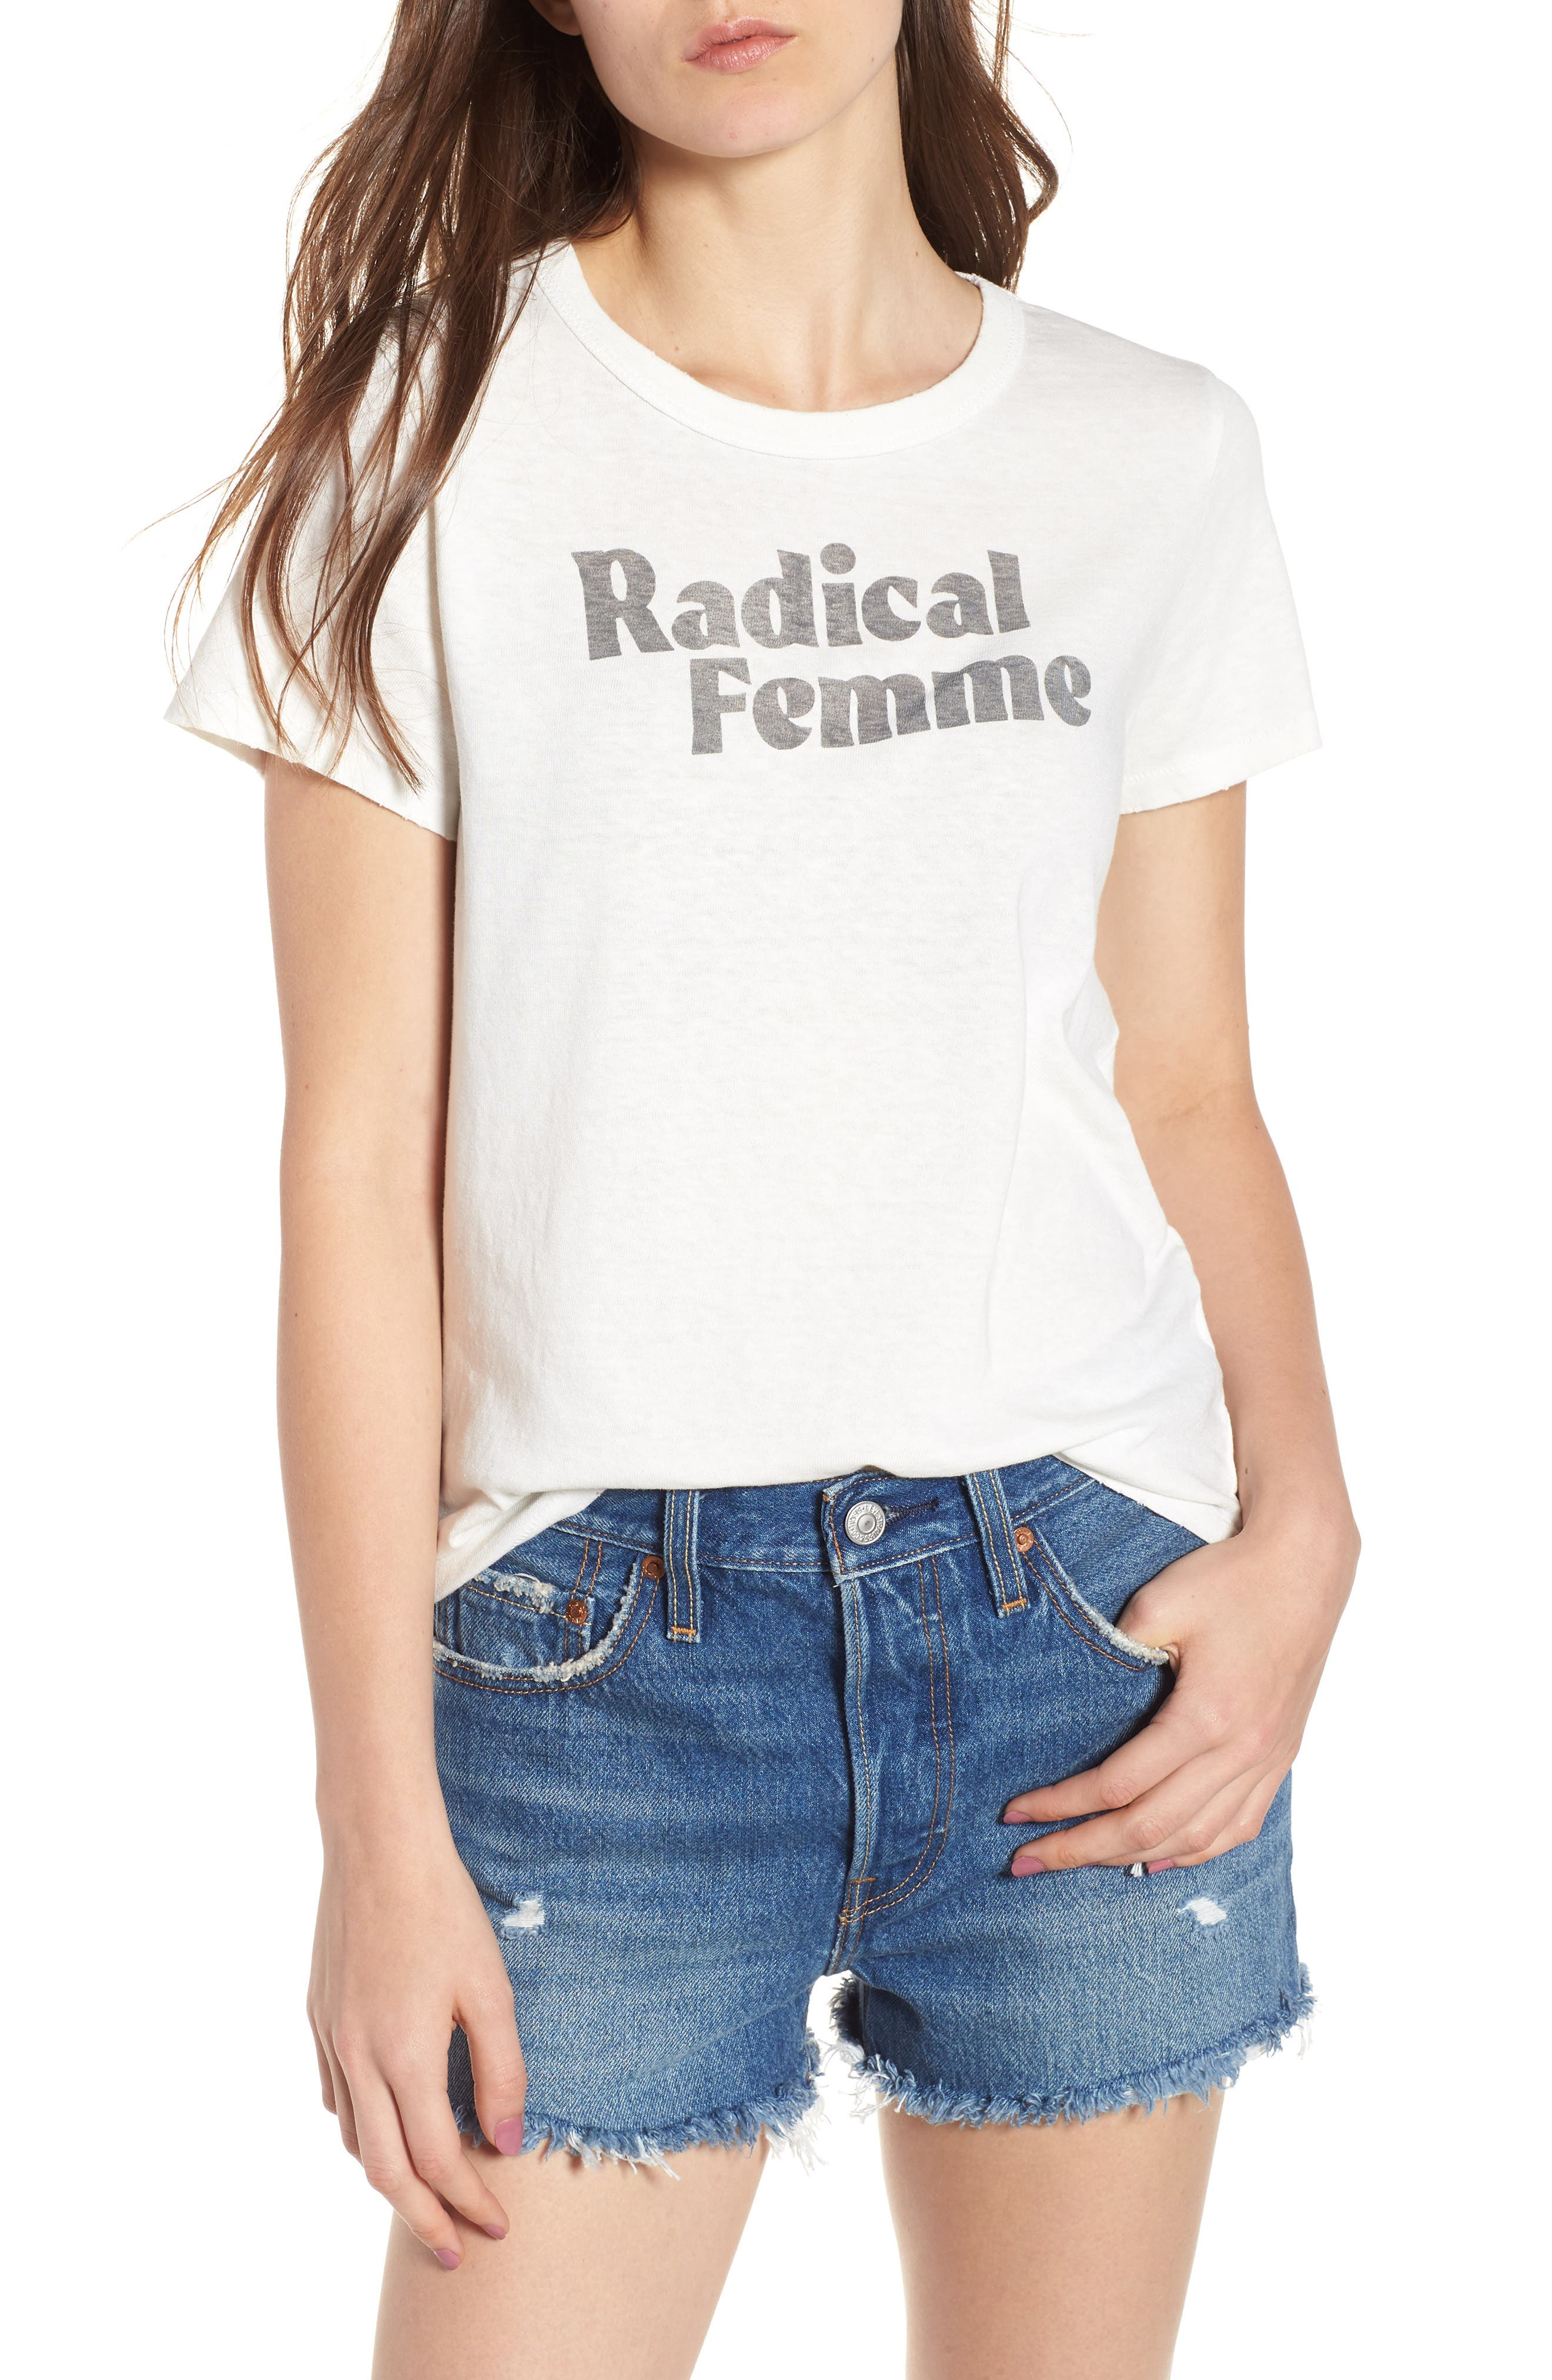 Radical Femme Tee,                             Main thumbnail 1, color,